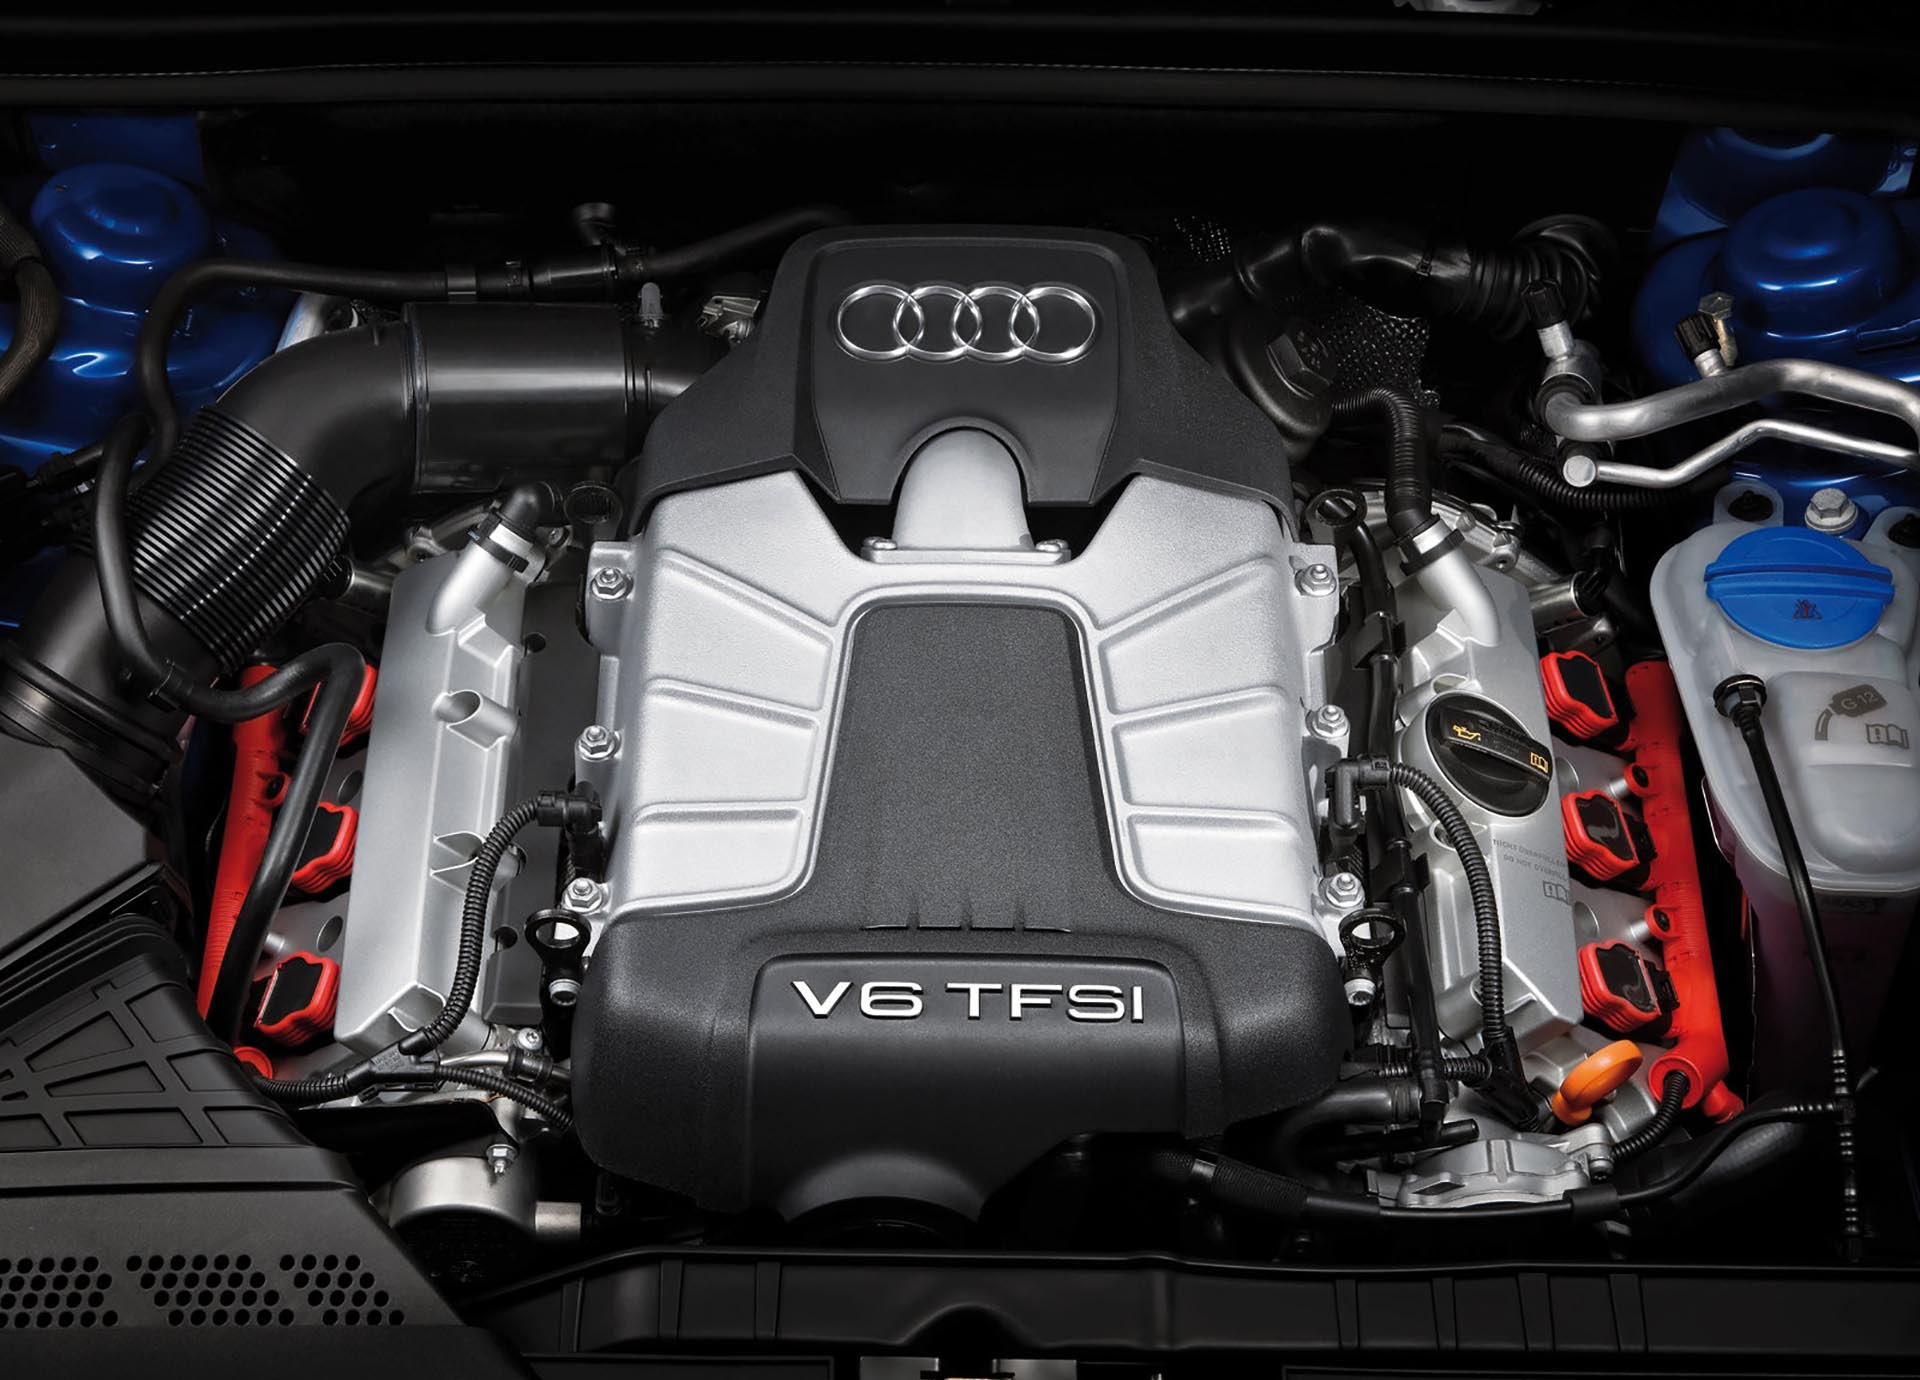 01_B8 Audi S4 3.0t TFSI engine